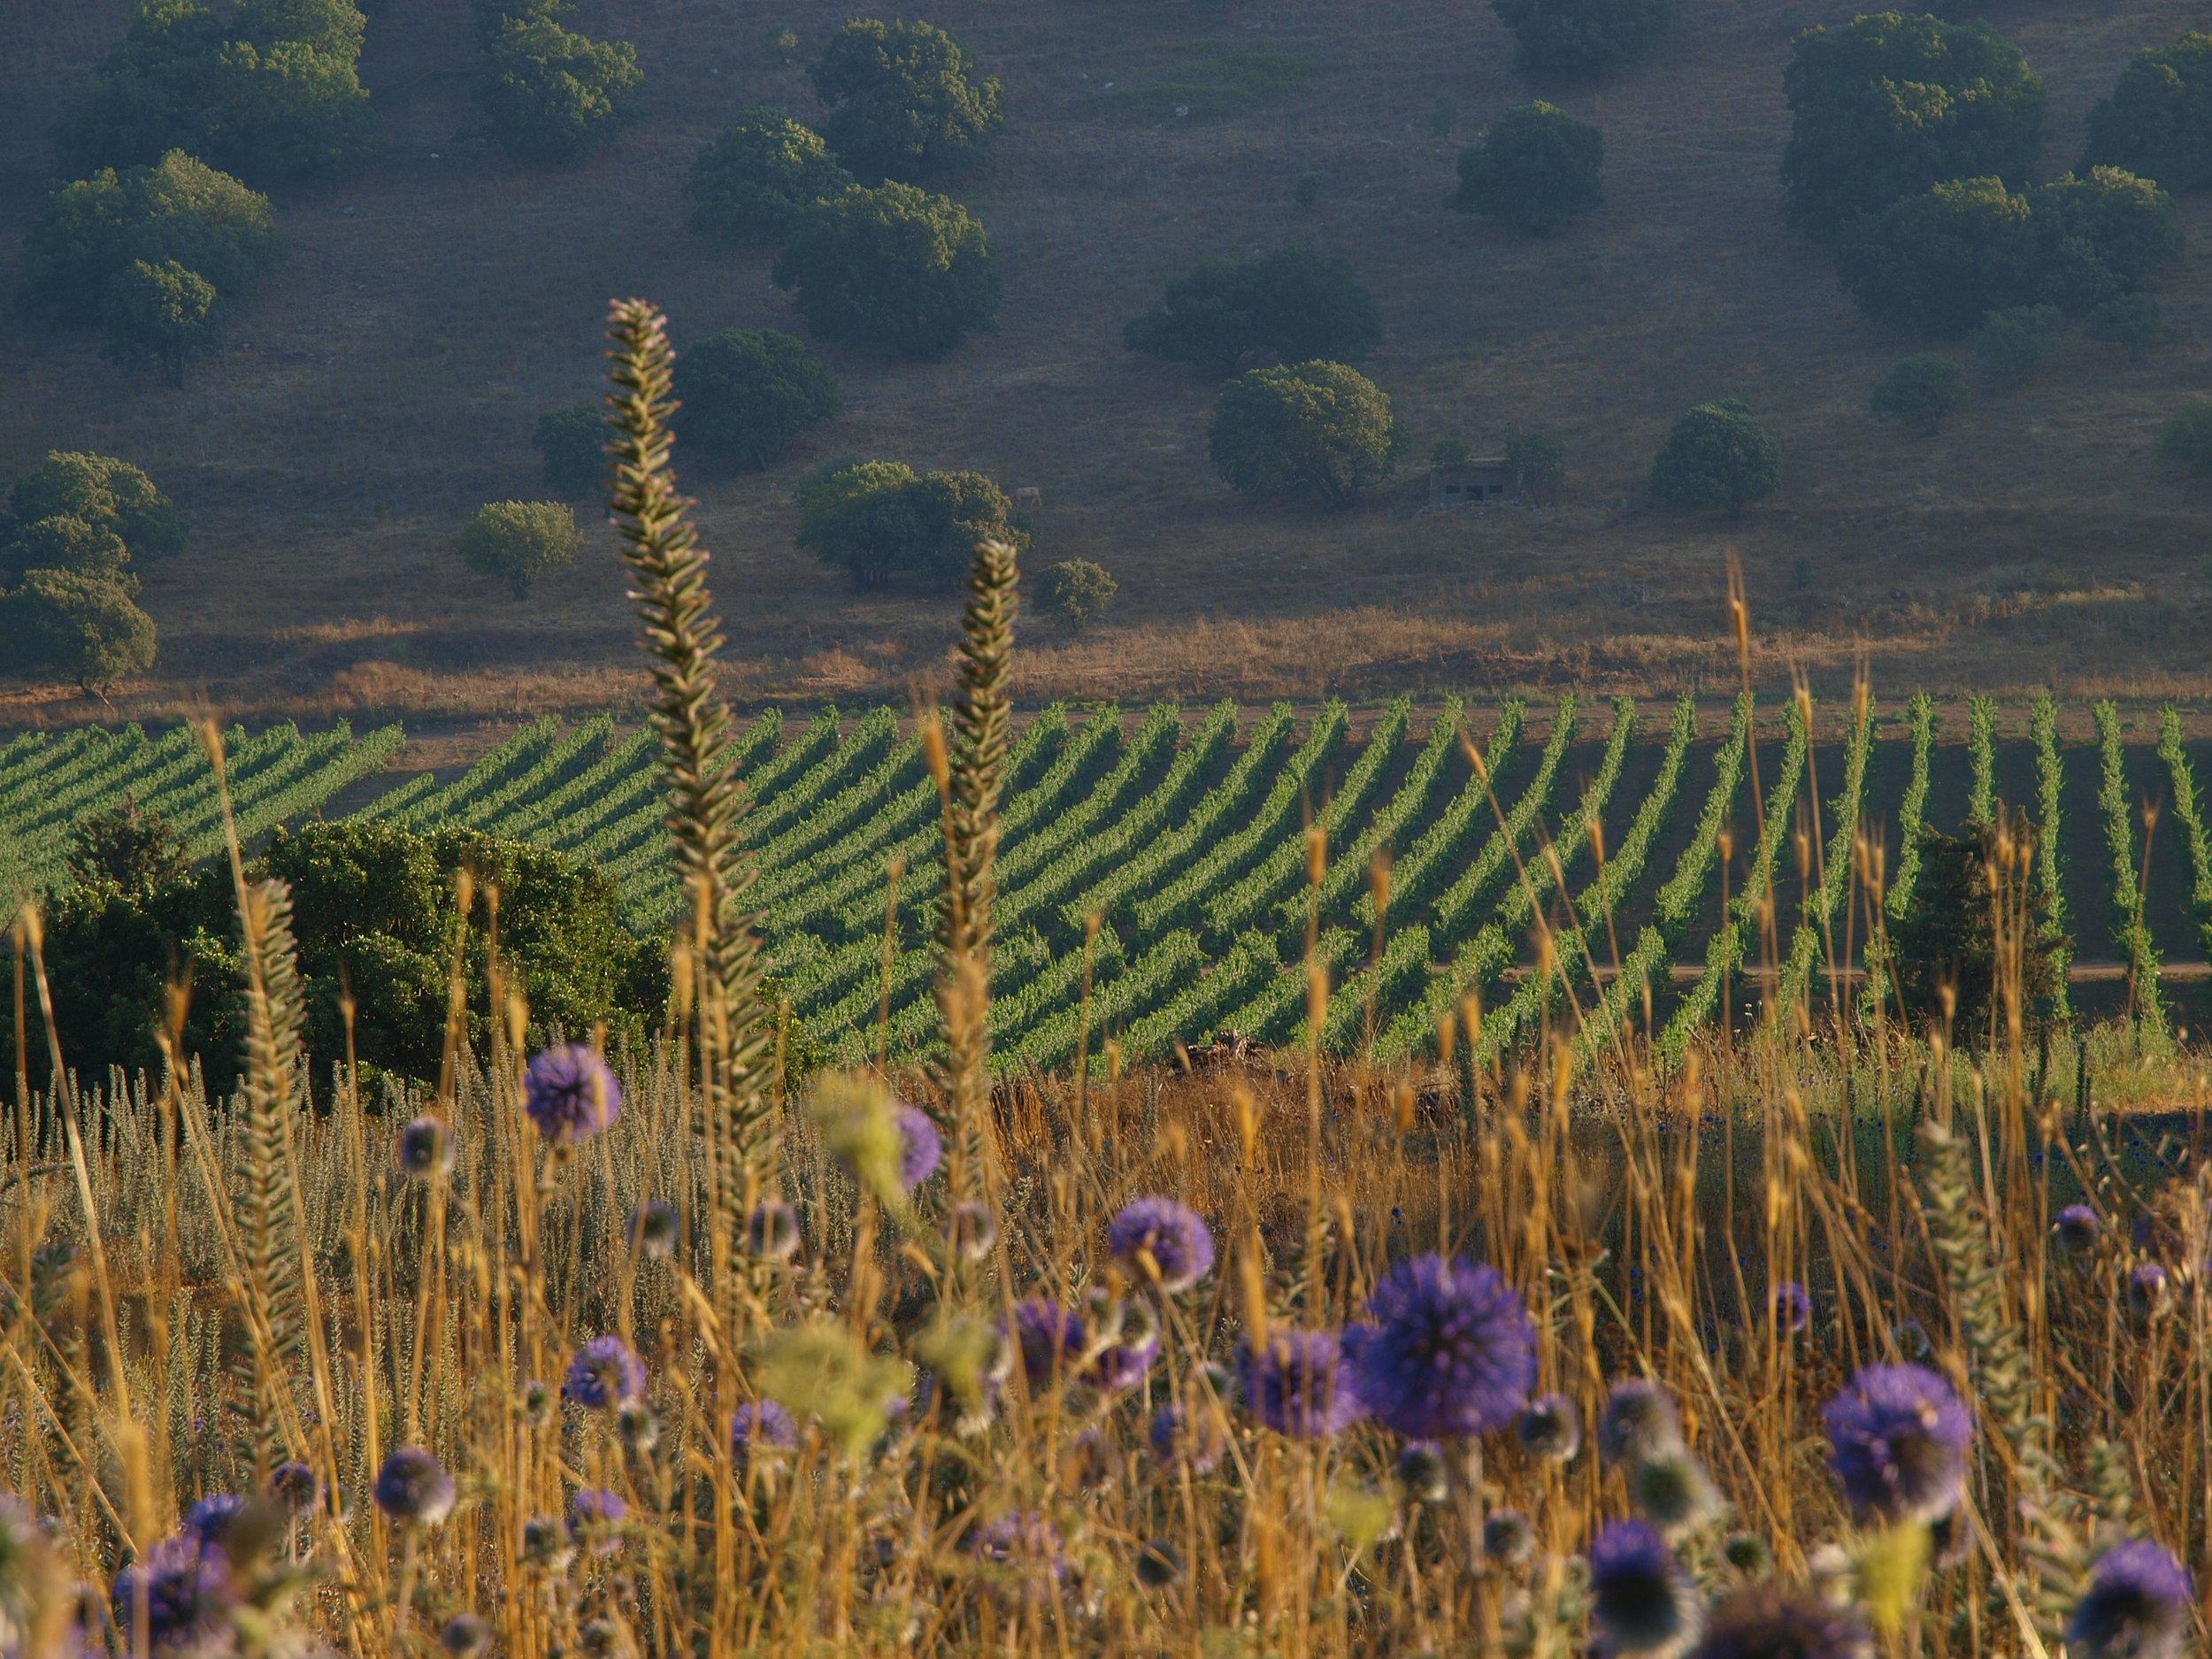 Yarden GHW Mt. Avital vineyards-Sumer 2008.jpg